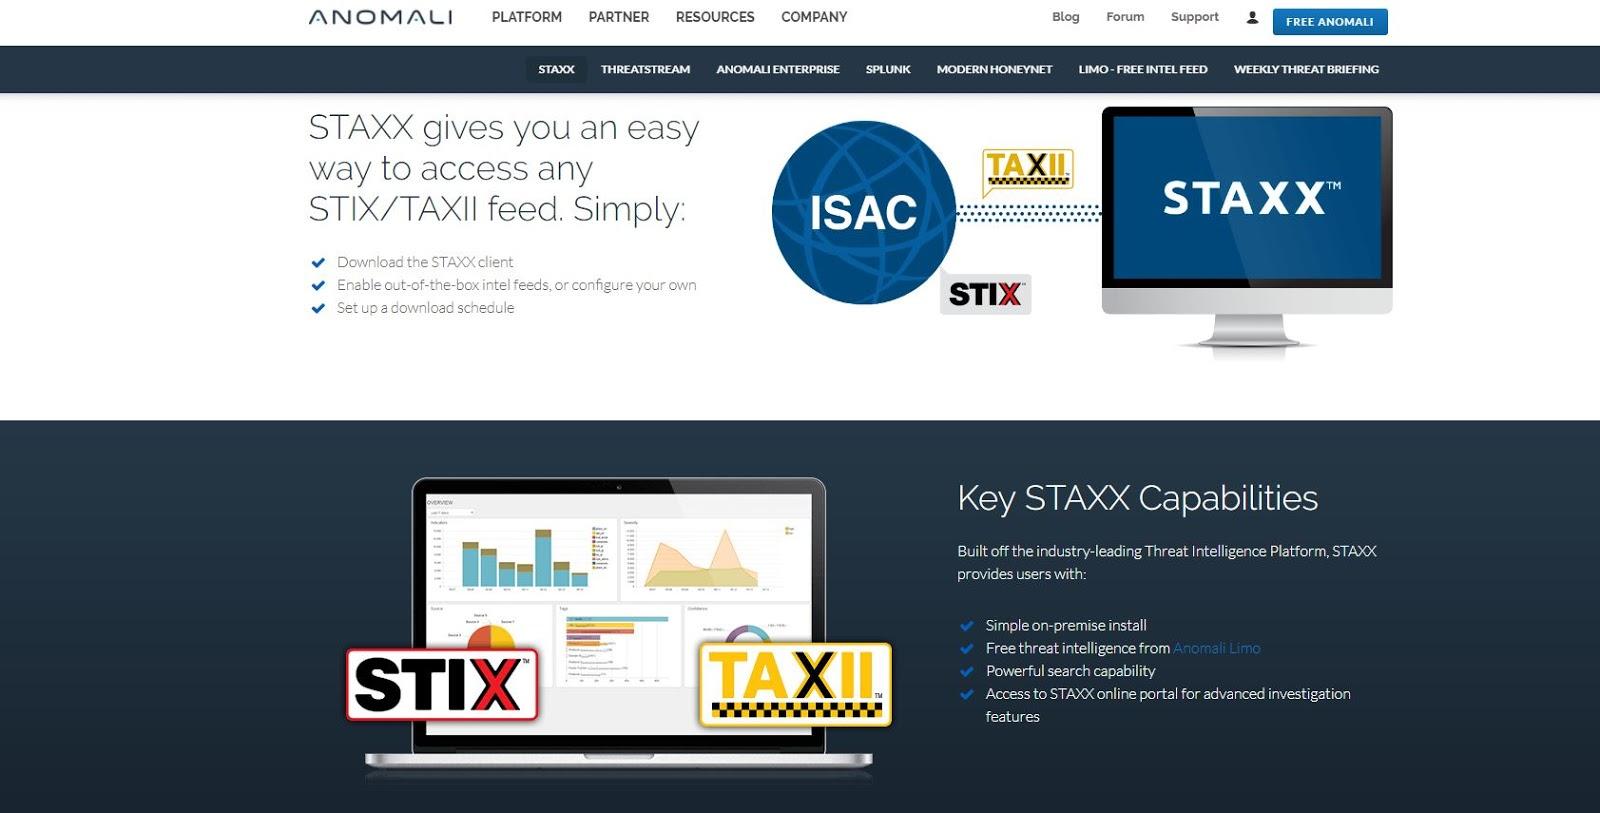 Threat Intelligence with Anomali STAXX